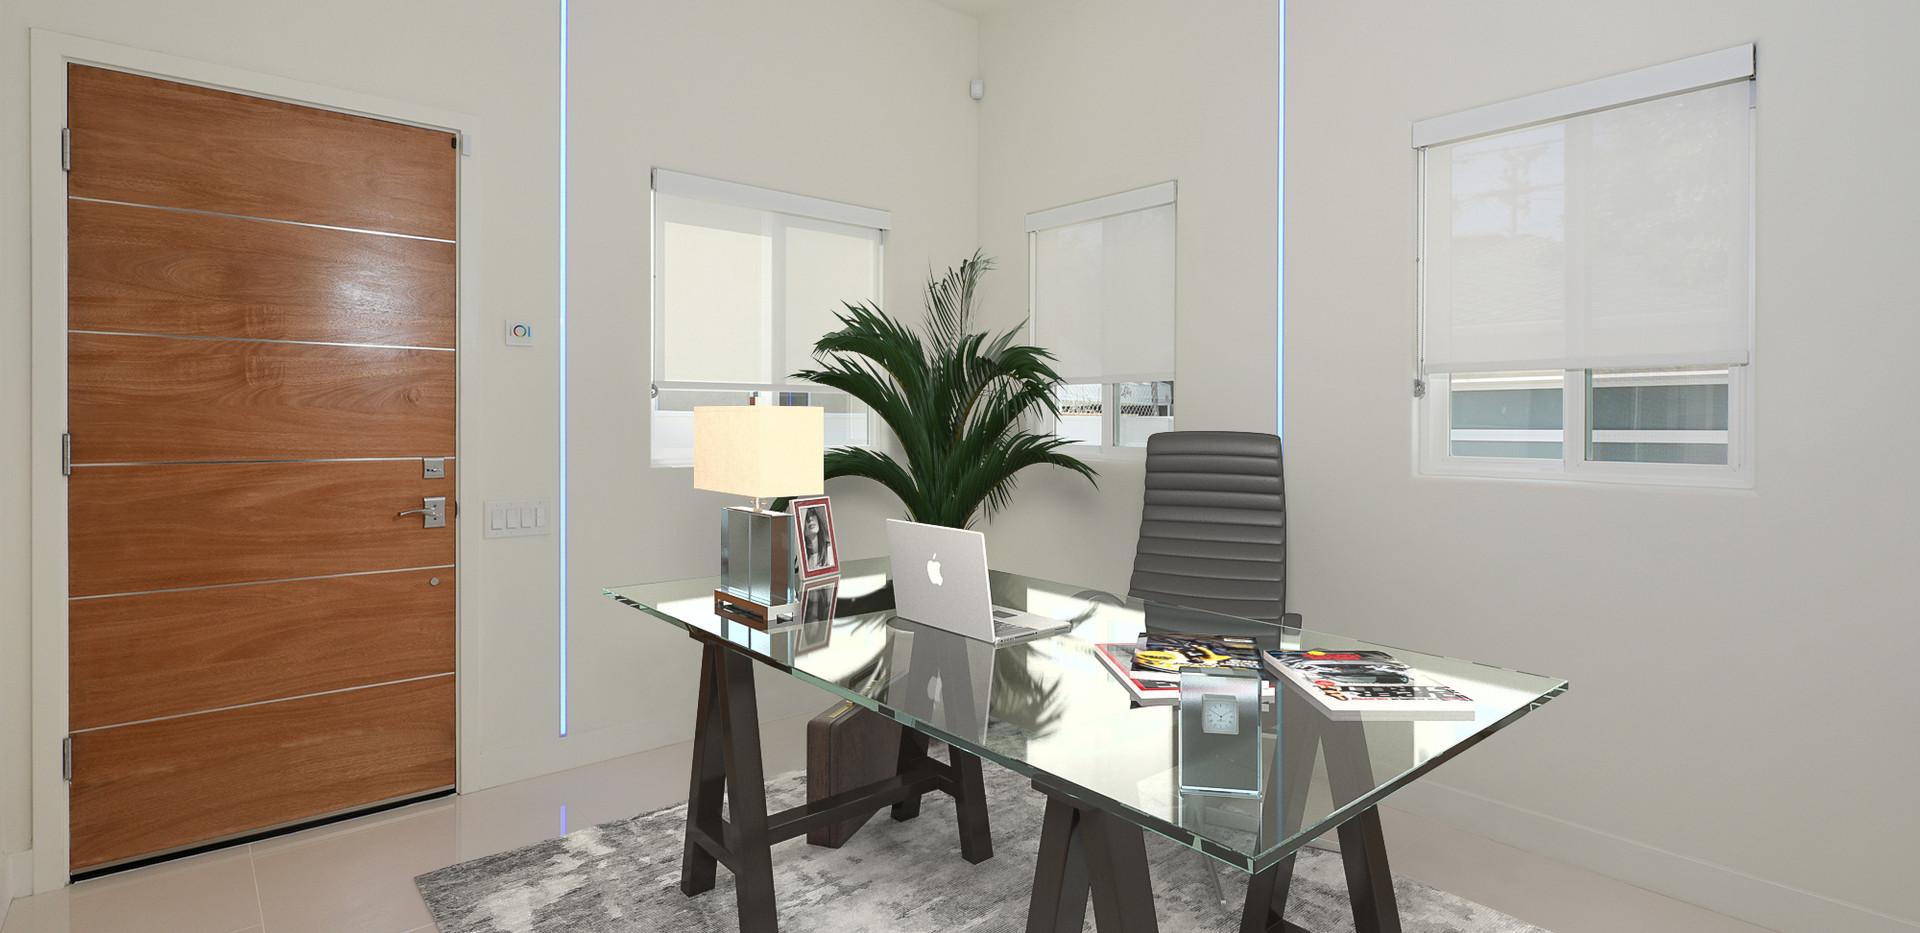 Office Staged v2.jpg